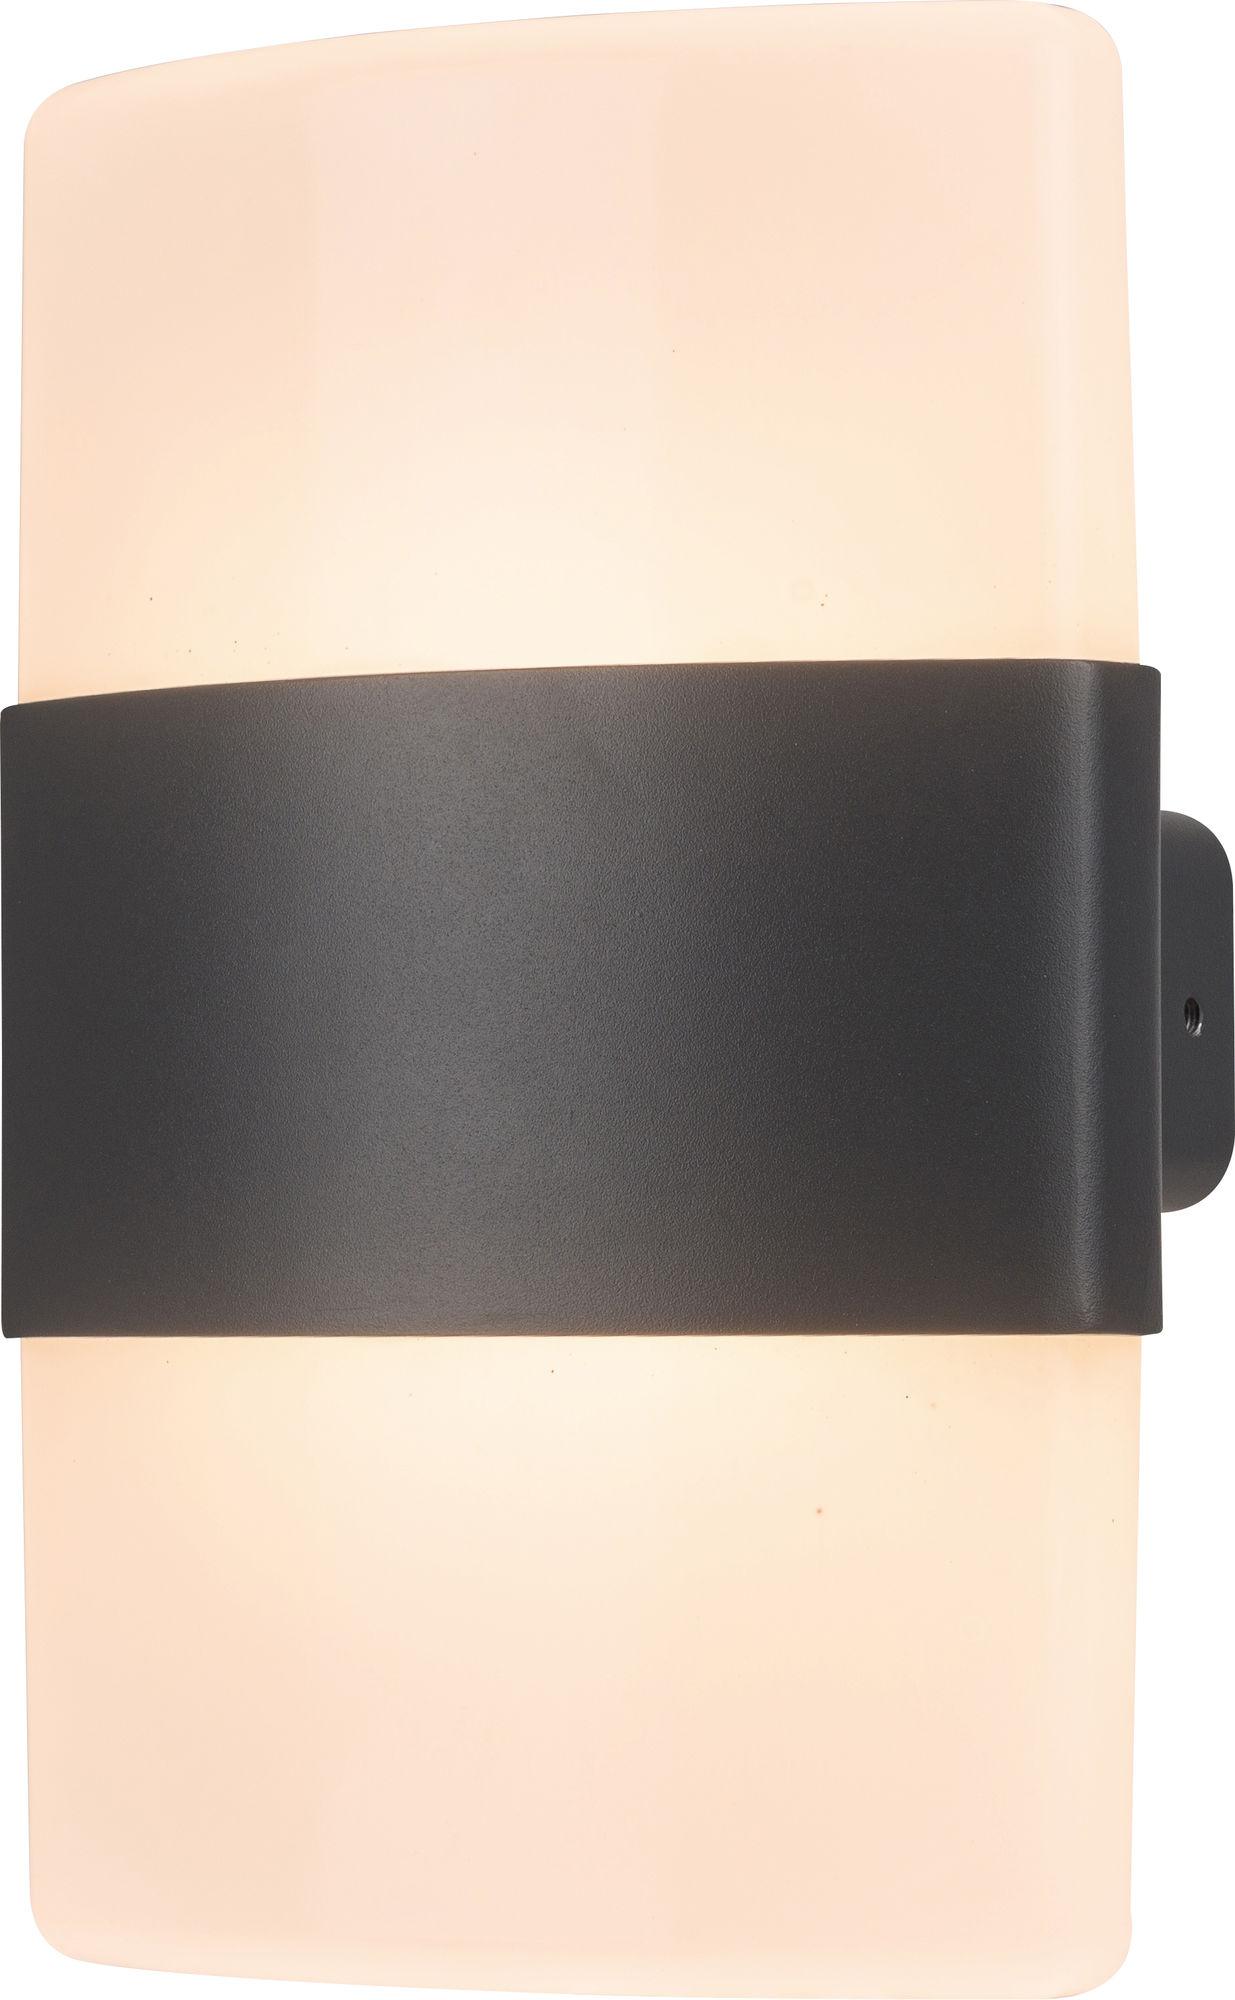 Настенный светильник Maytoni O006WL L12GR